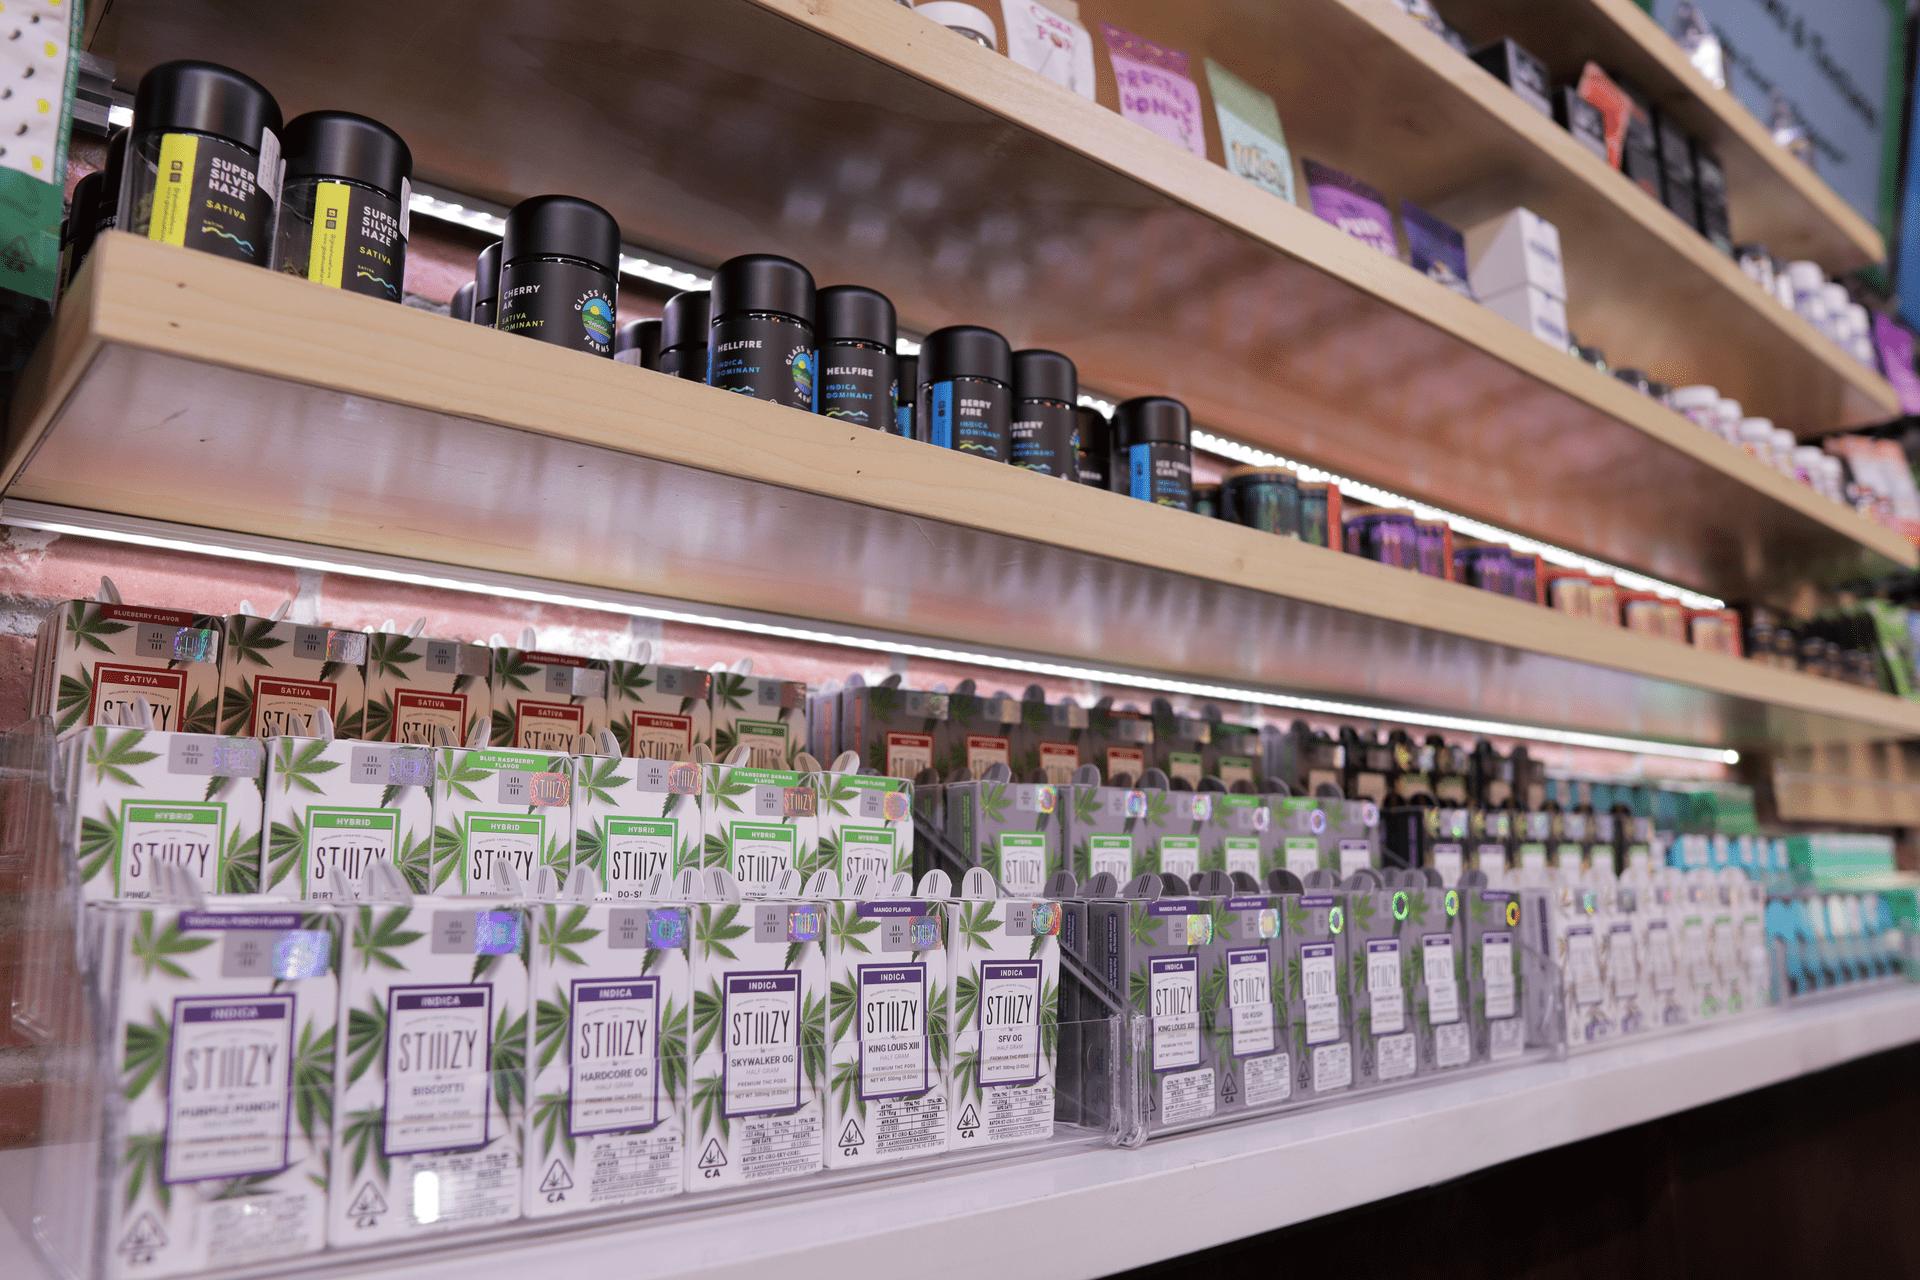 Vape Cartridge Shelves